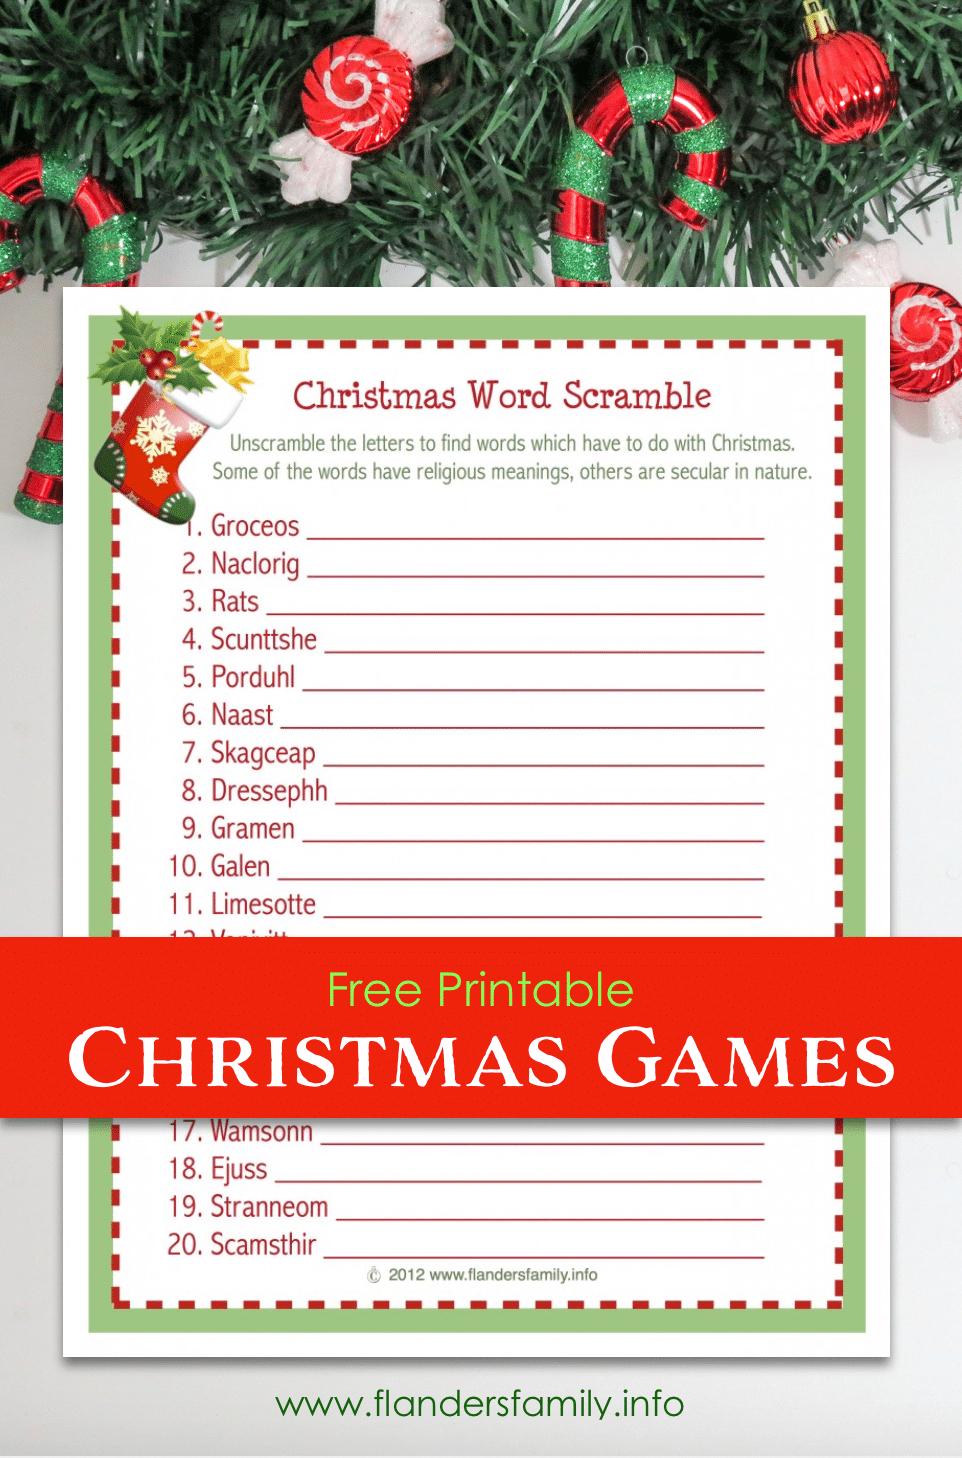 Christmas Word Scramble (Free Printable) - Flanders Family Homelife - Free Printable Christmas Word Scramble With Answers